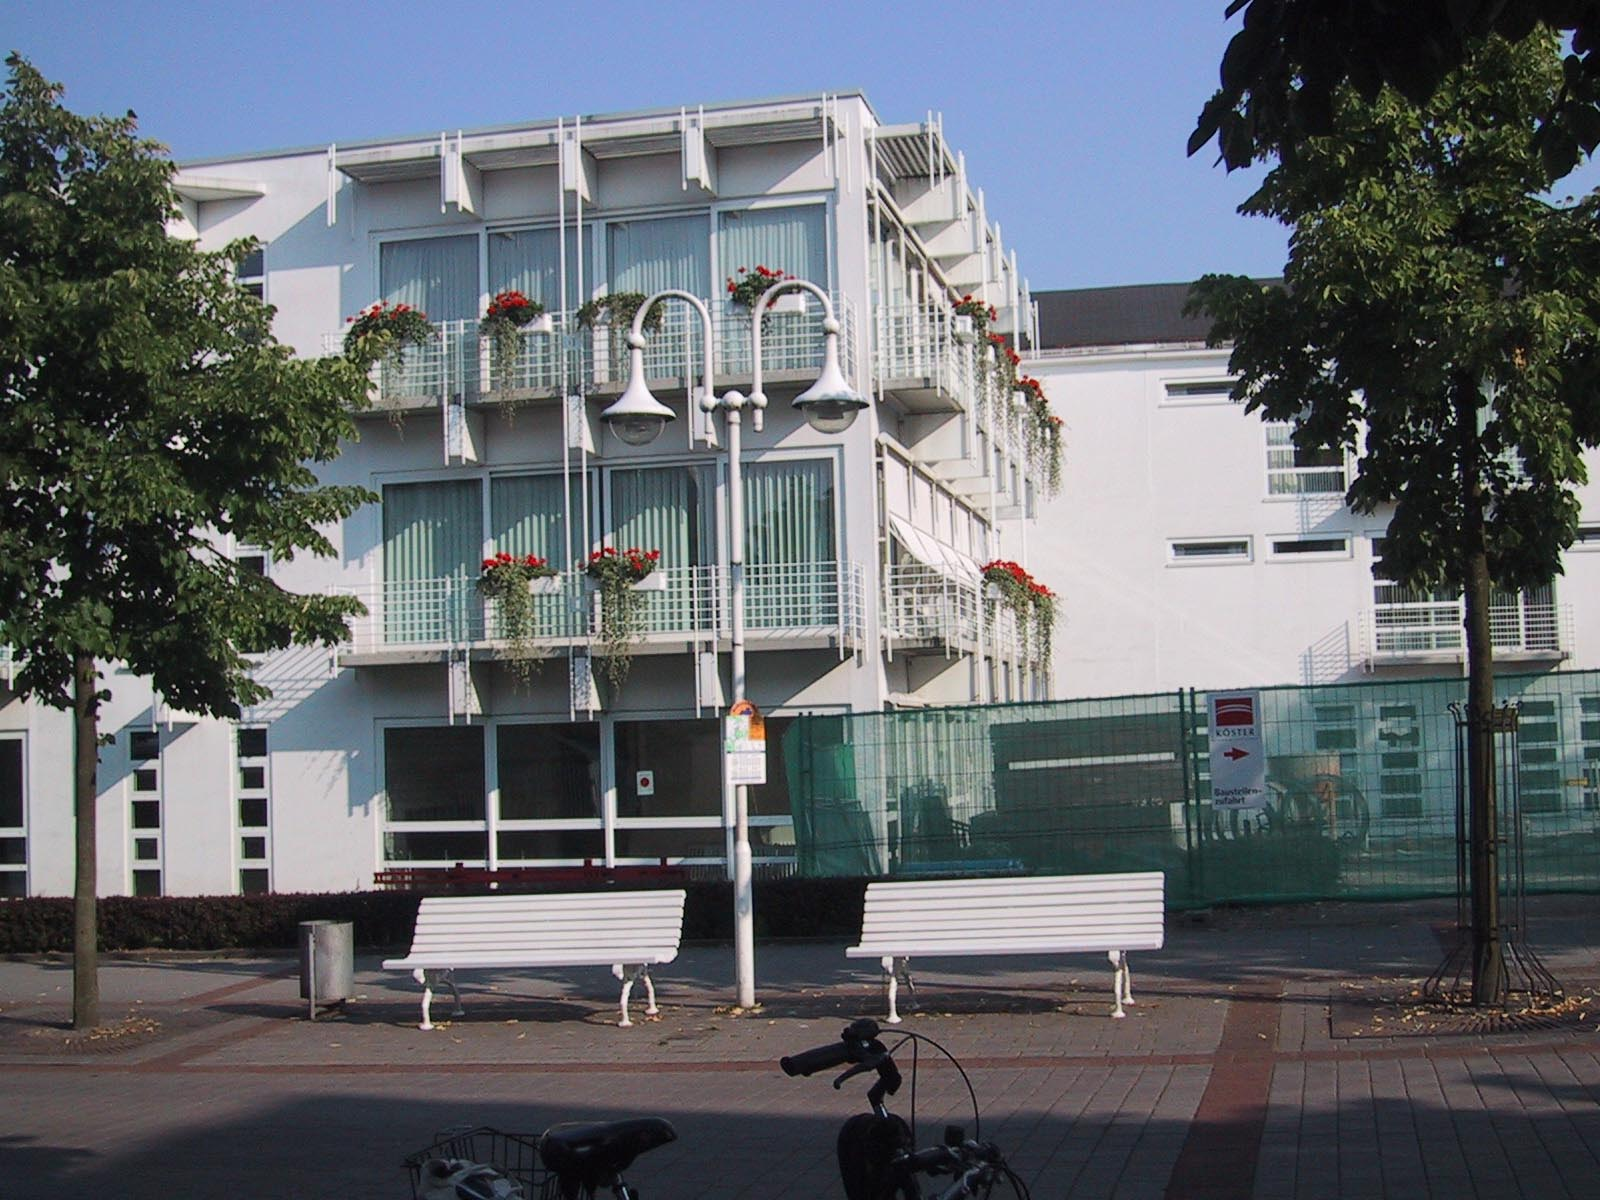 gollwitzer meier klinik bad oeynhausen dr berrou. Black Bedroom Furniture Sets. Home Design Ideas